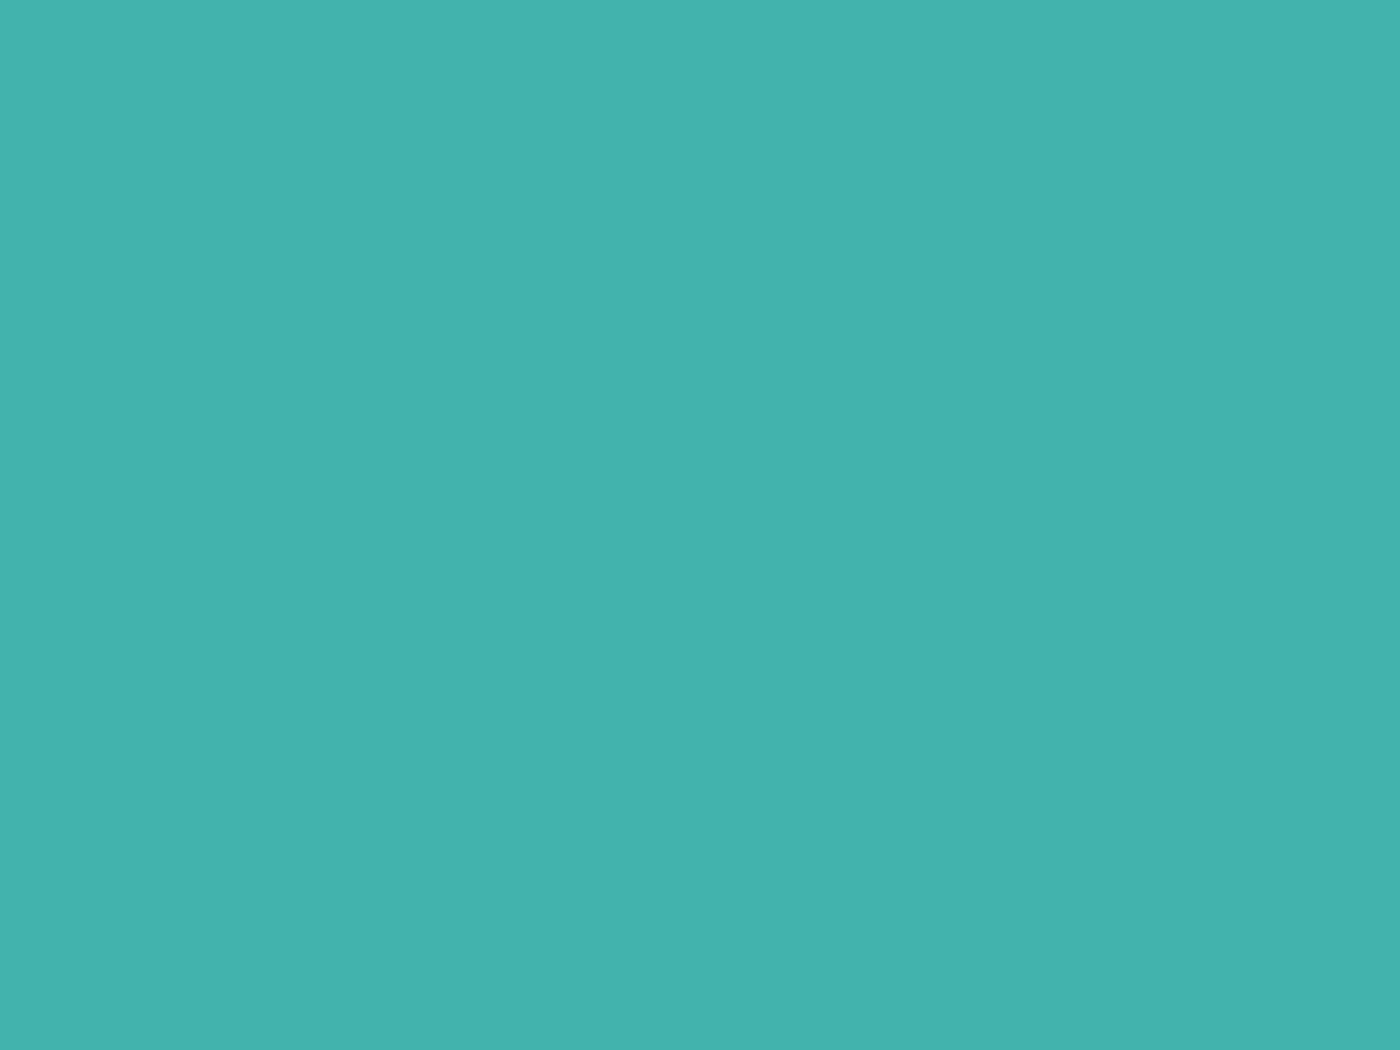 1400x1050 Verdigris Solid Color Background